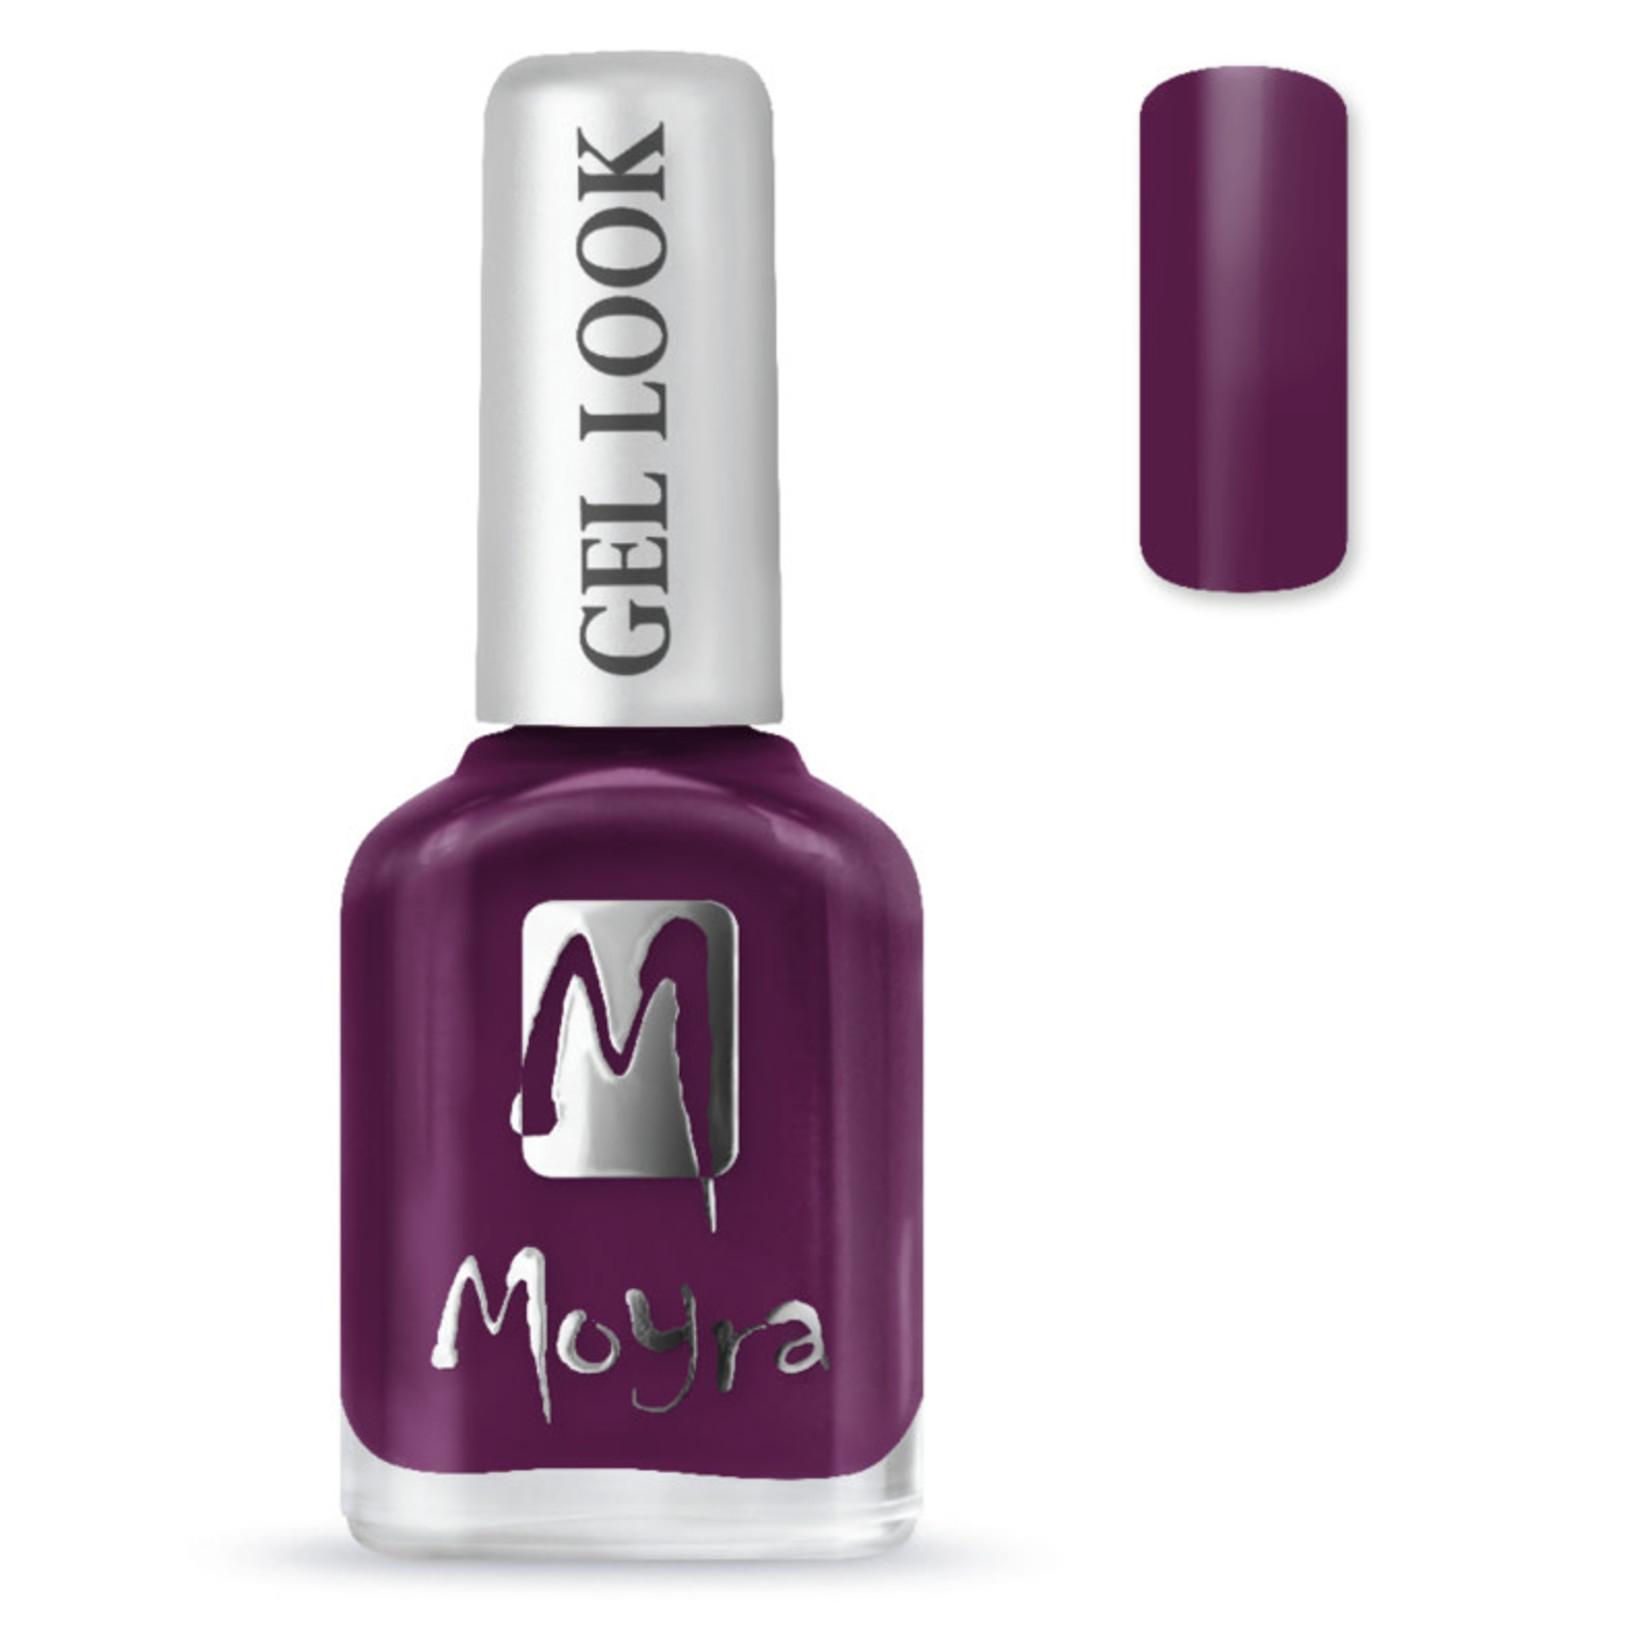 Moyra Moyra Gel Look nail polish 911 Chloe